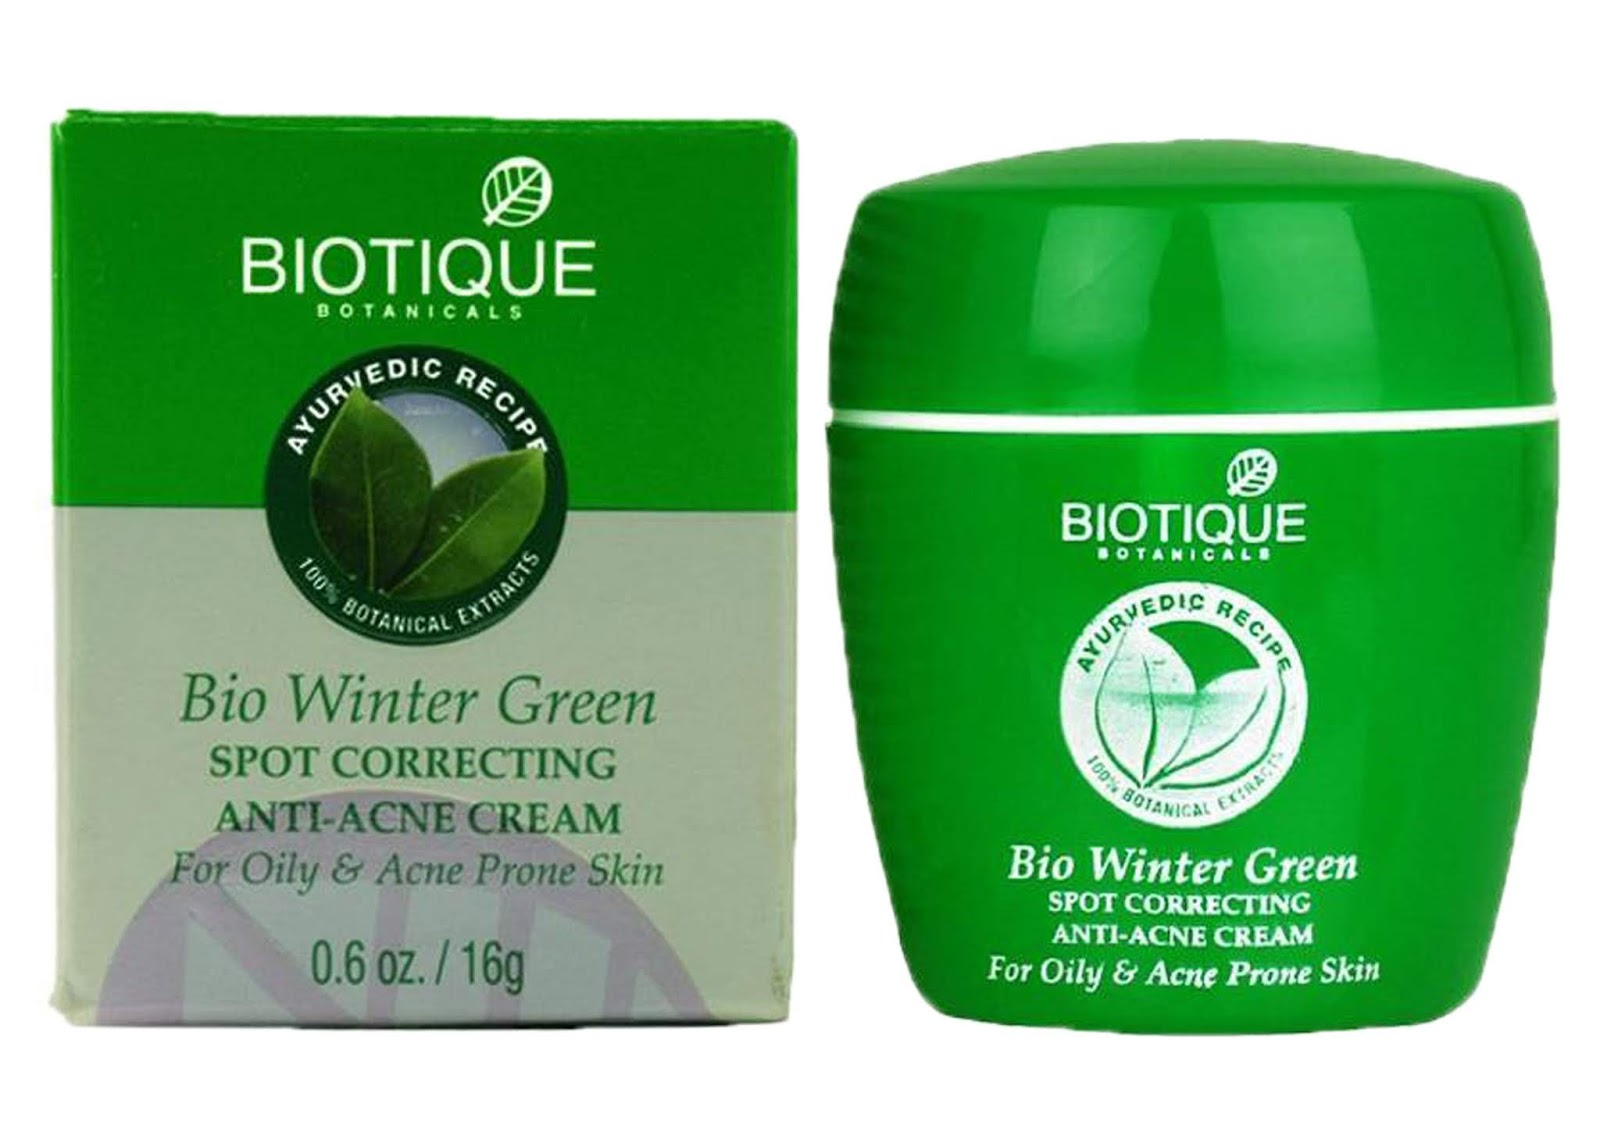 Biotique Bio Winter Green Spot Correcting Anti Acne Cream 15g Skin Care Acne & Blemish Treatments